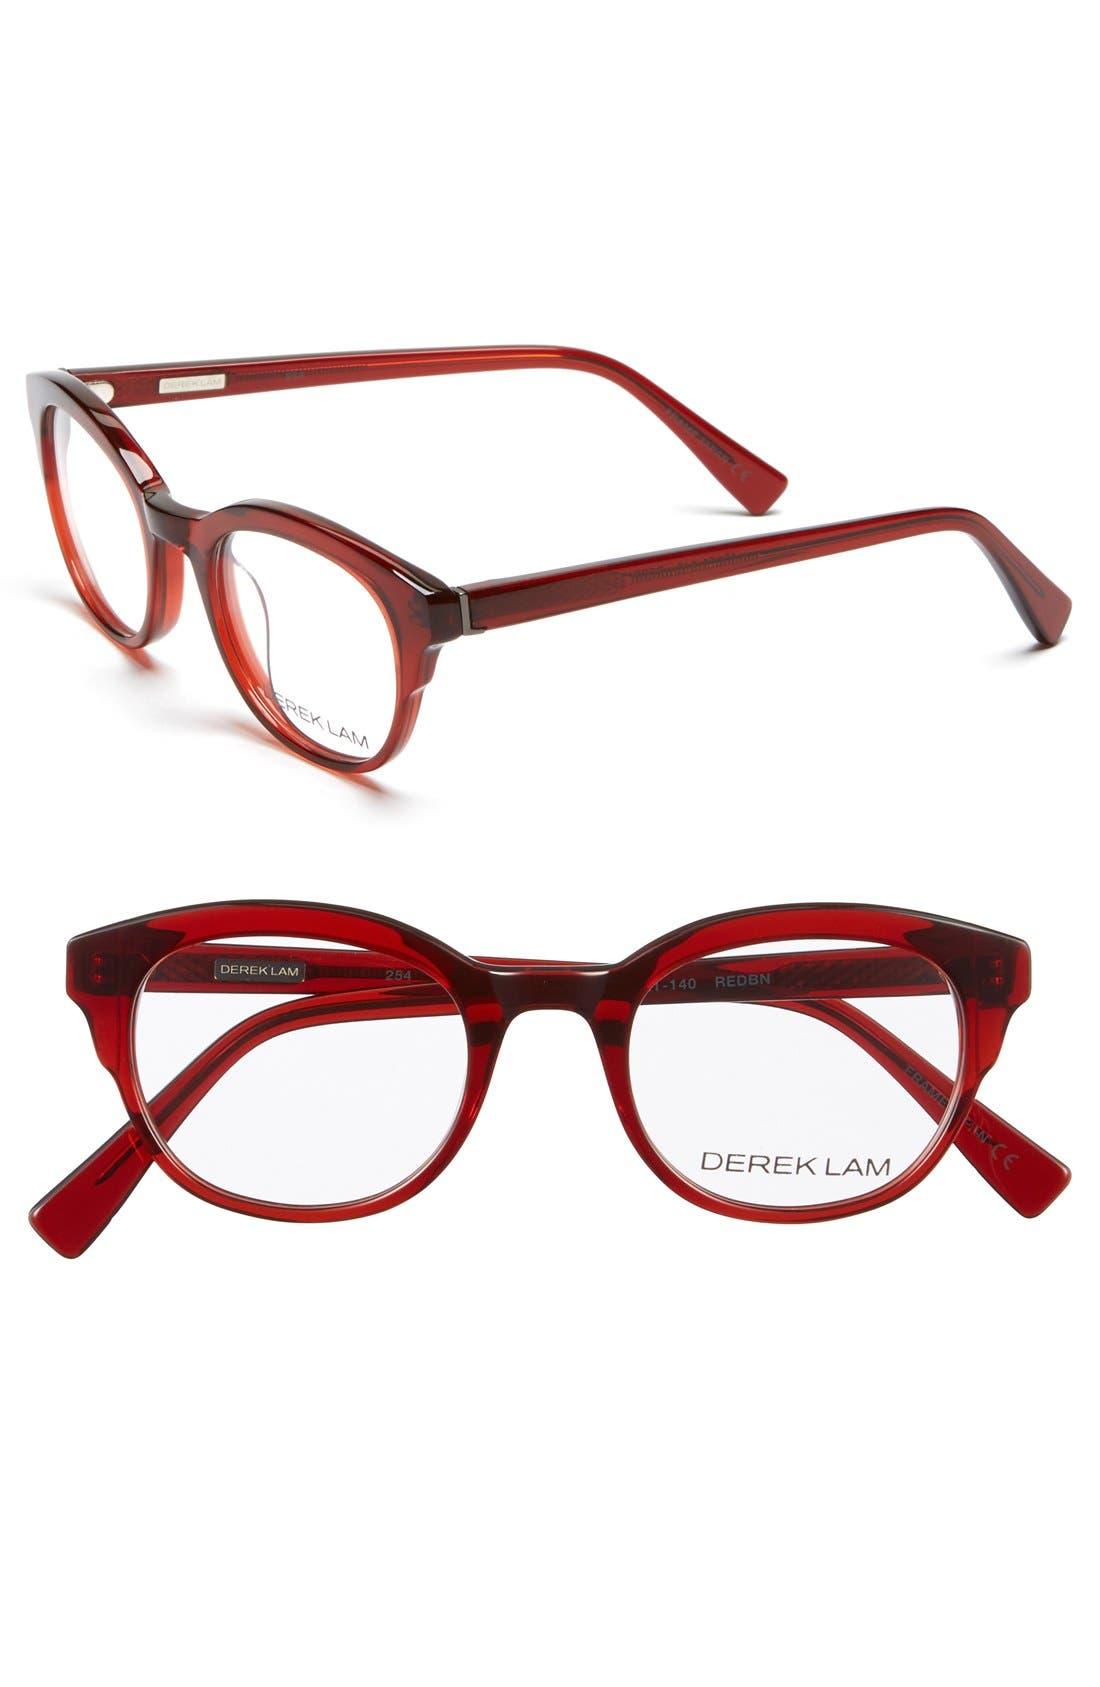 Derek Lam 46mm Optical Glasses